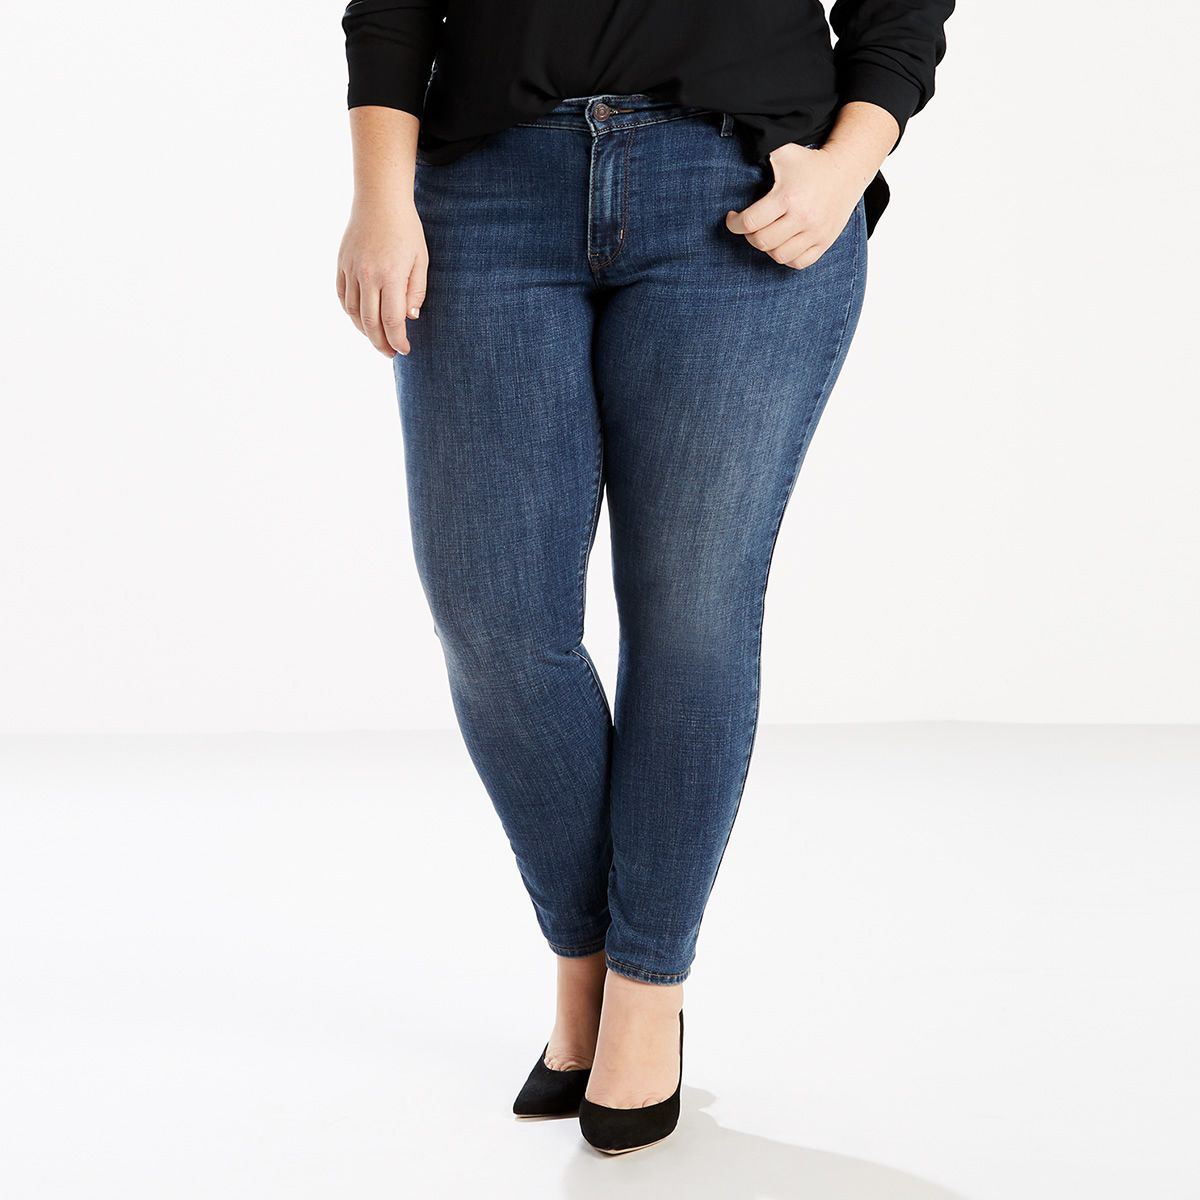 cfeb8763976 Womens Levis Jeans   Denim Apparel - Macy s